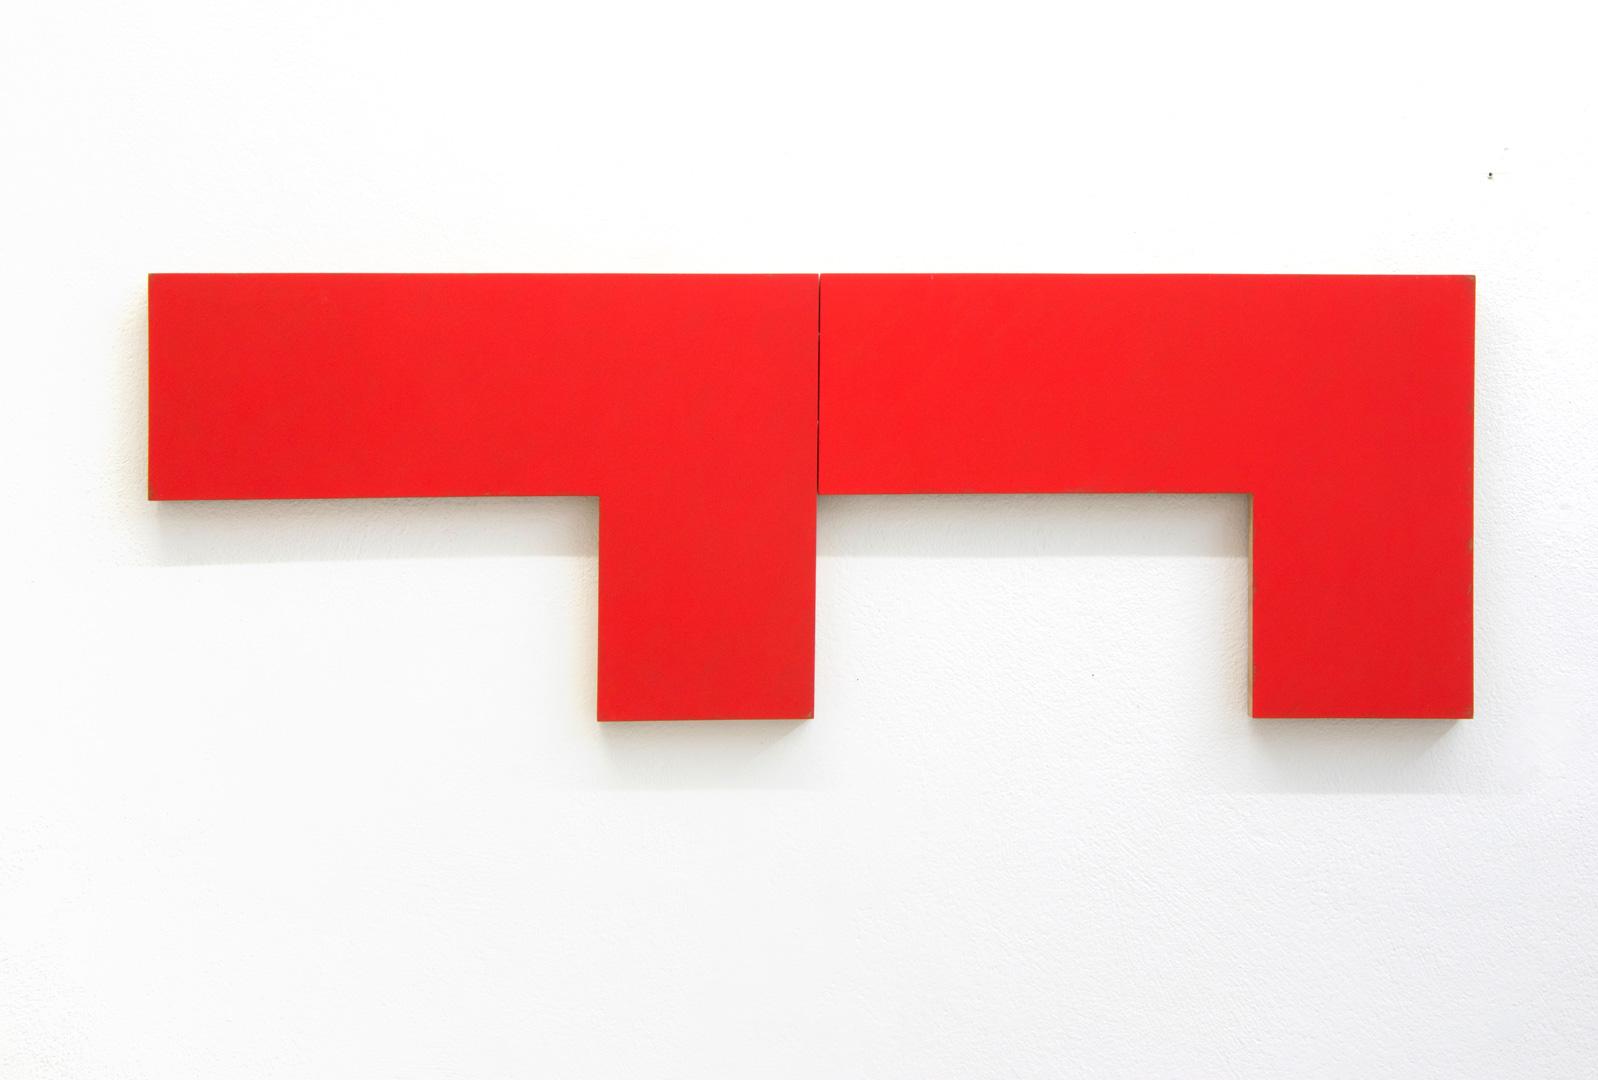 alfons lachauer, o.t. 1991, oil/wood, 40 x 90 cm